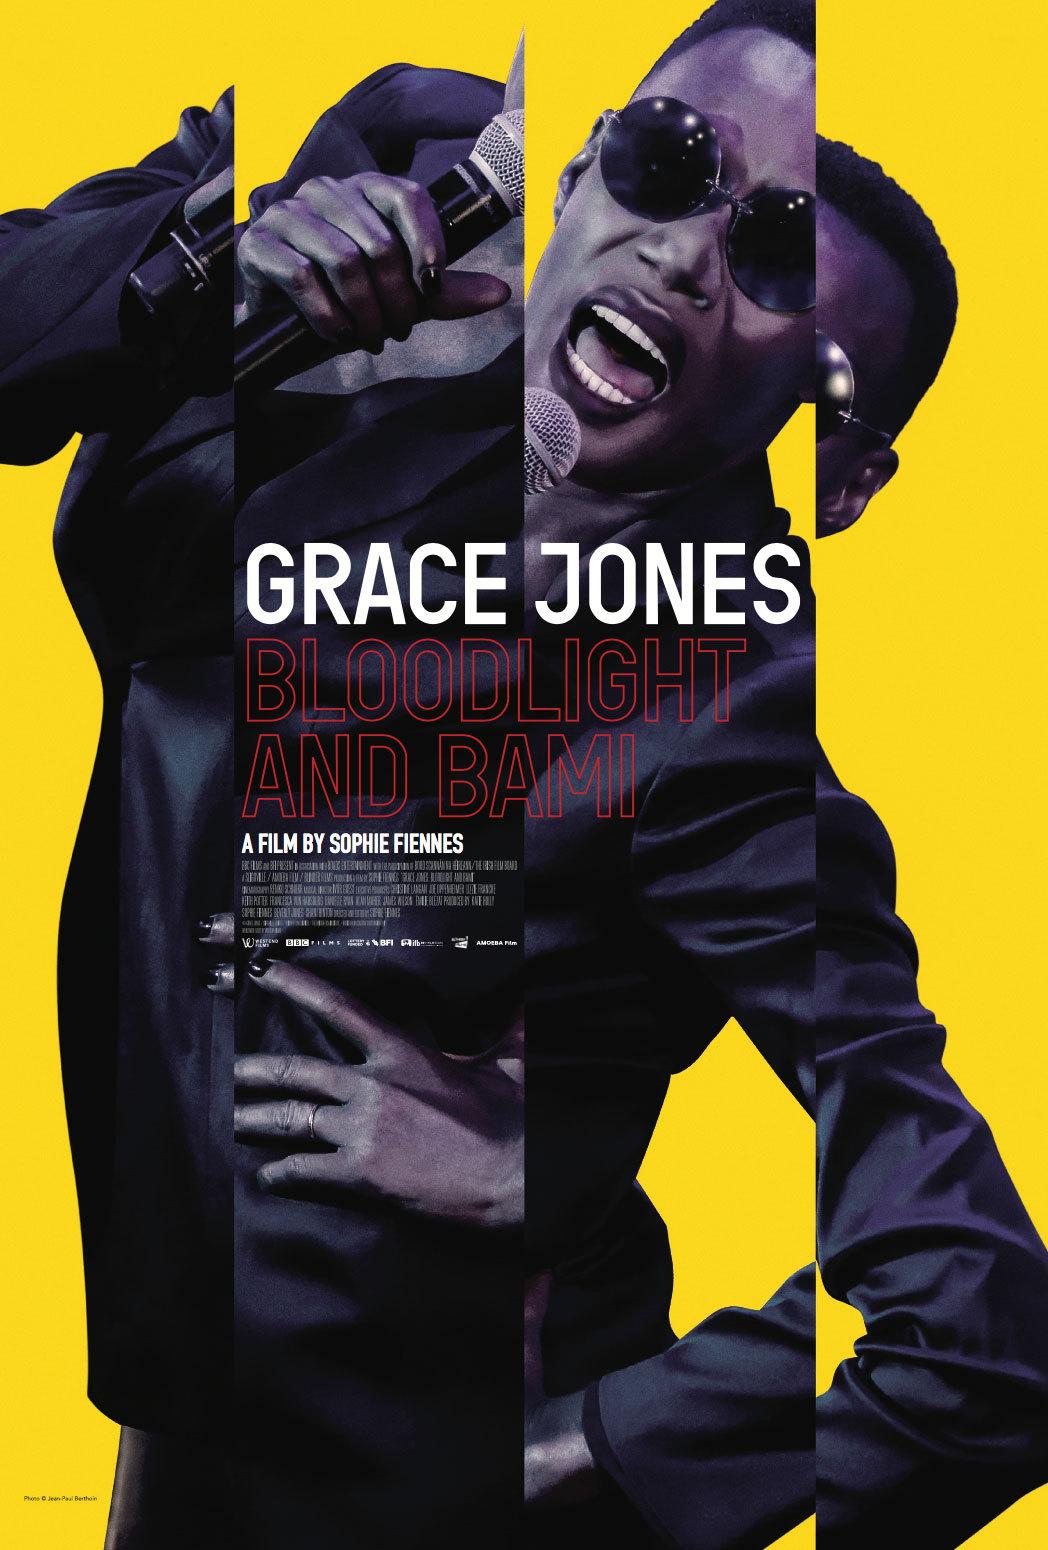 Grace-Jones-Bloodlight-film